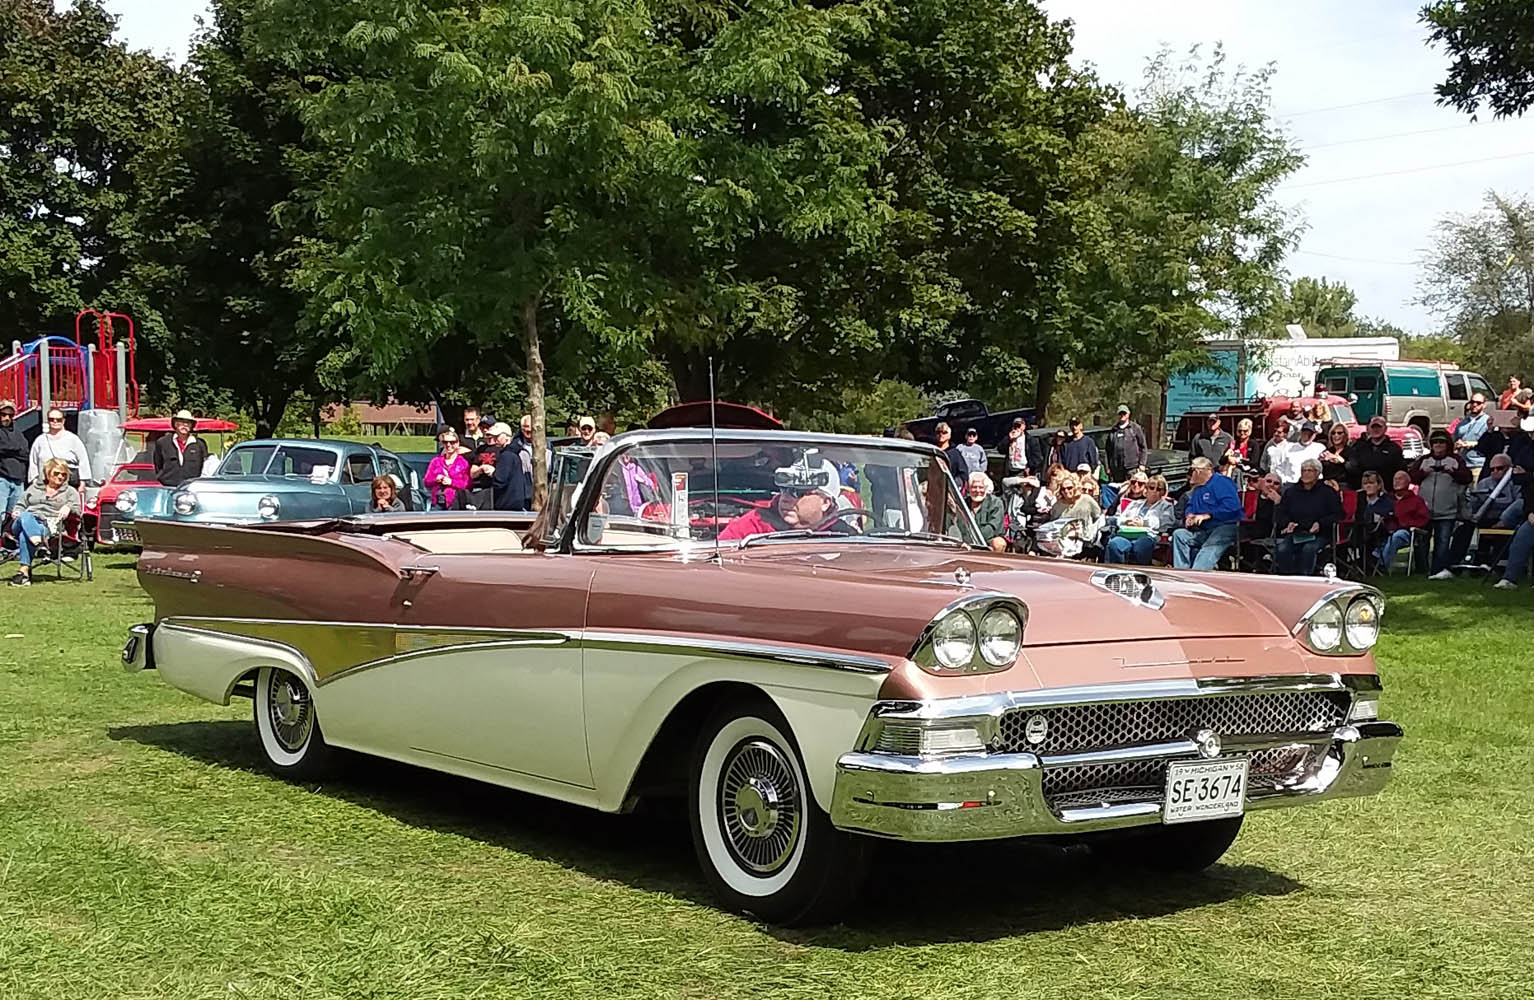 Top 25- 1958 Ford Skyliner, Brad Notter 1